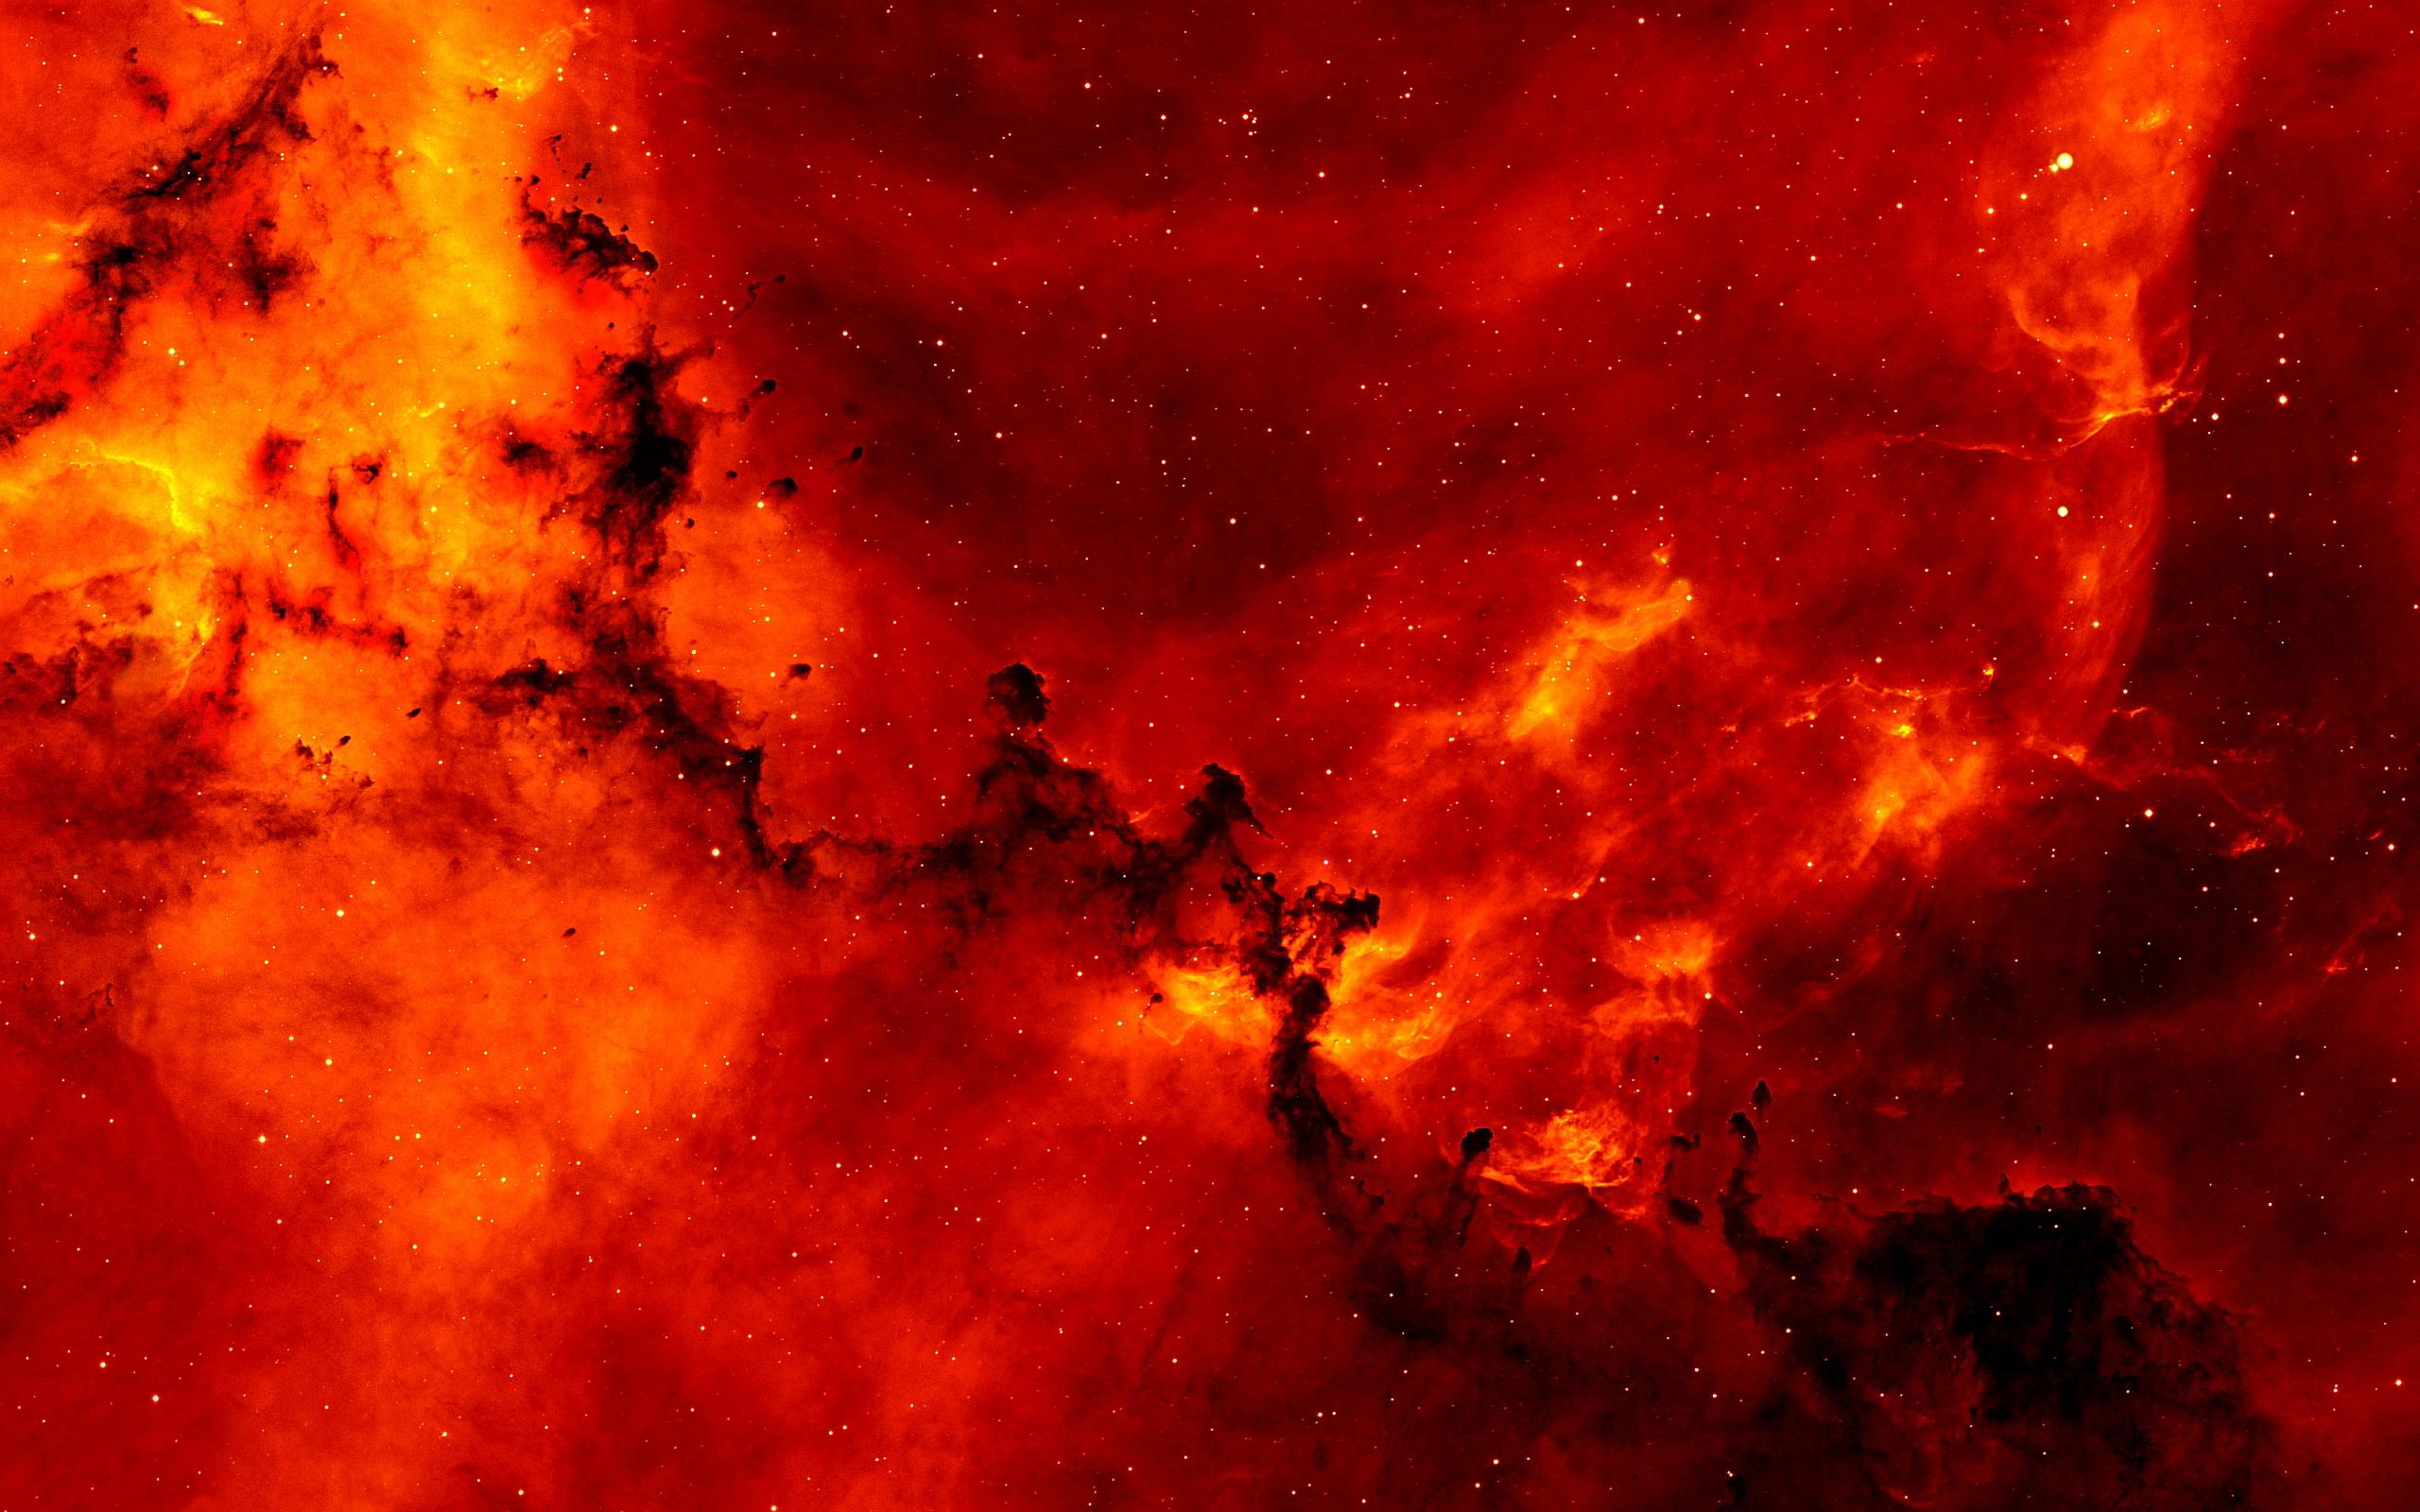 Red cosmic nebula